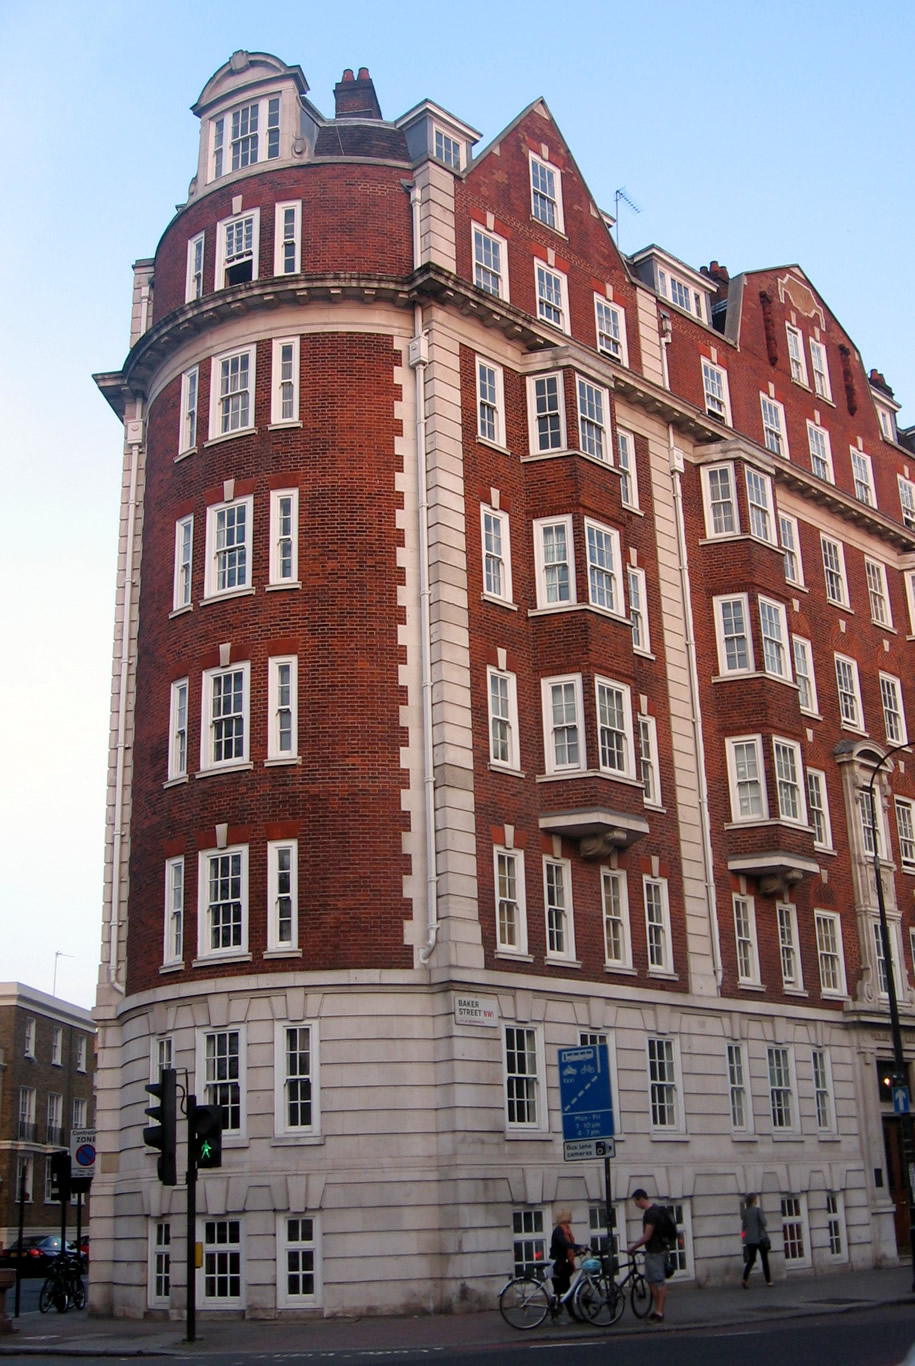 London 221b Baker Street